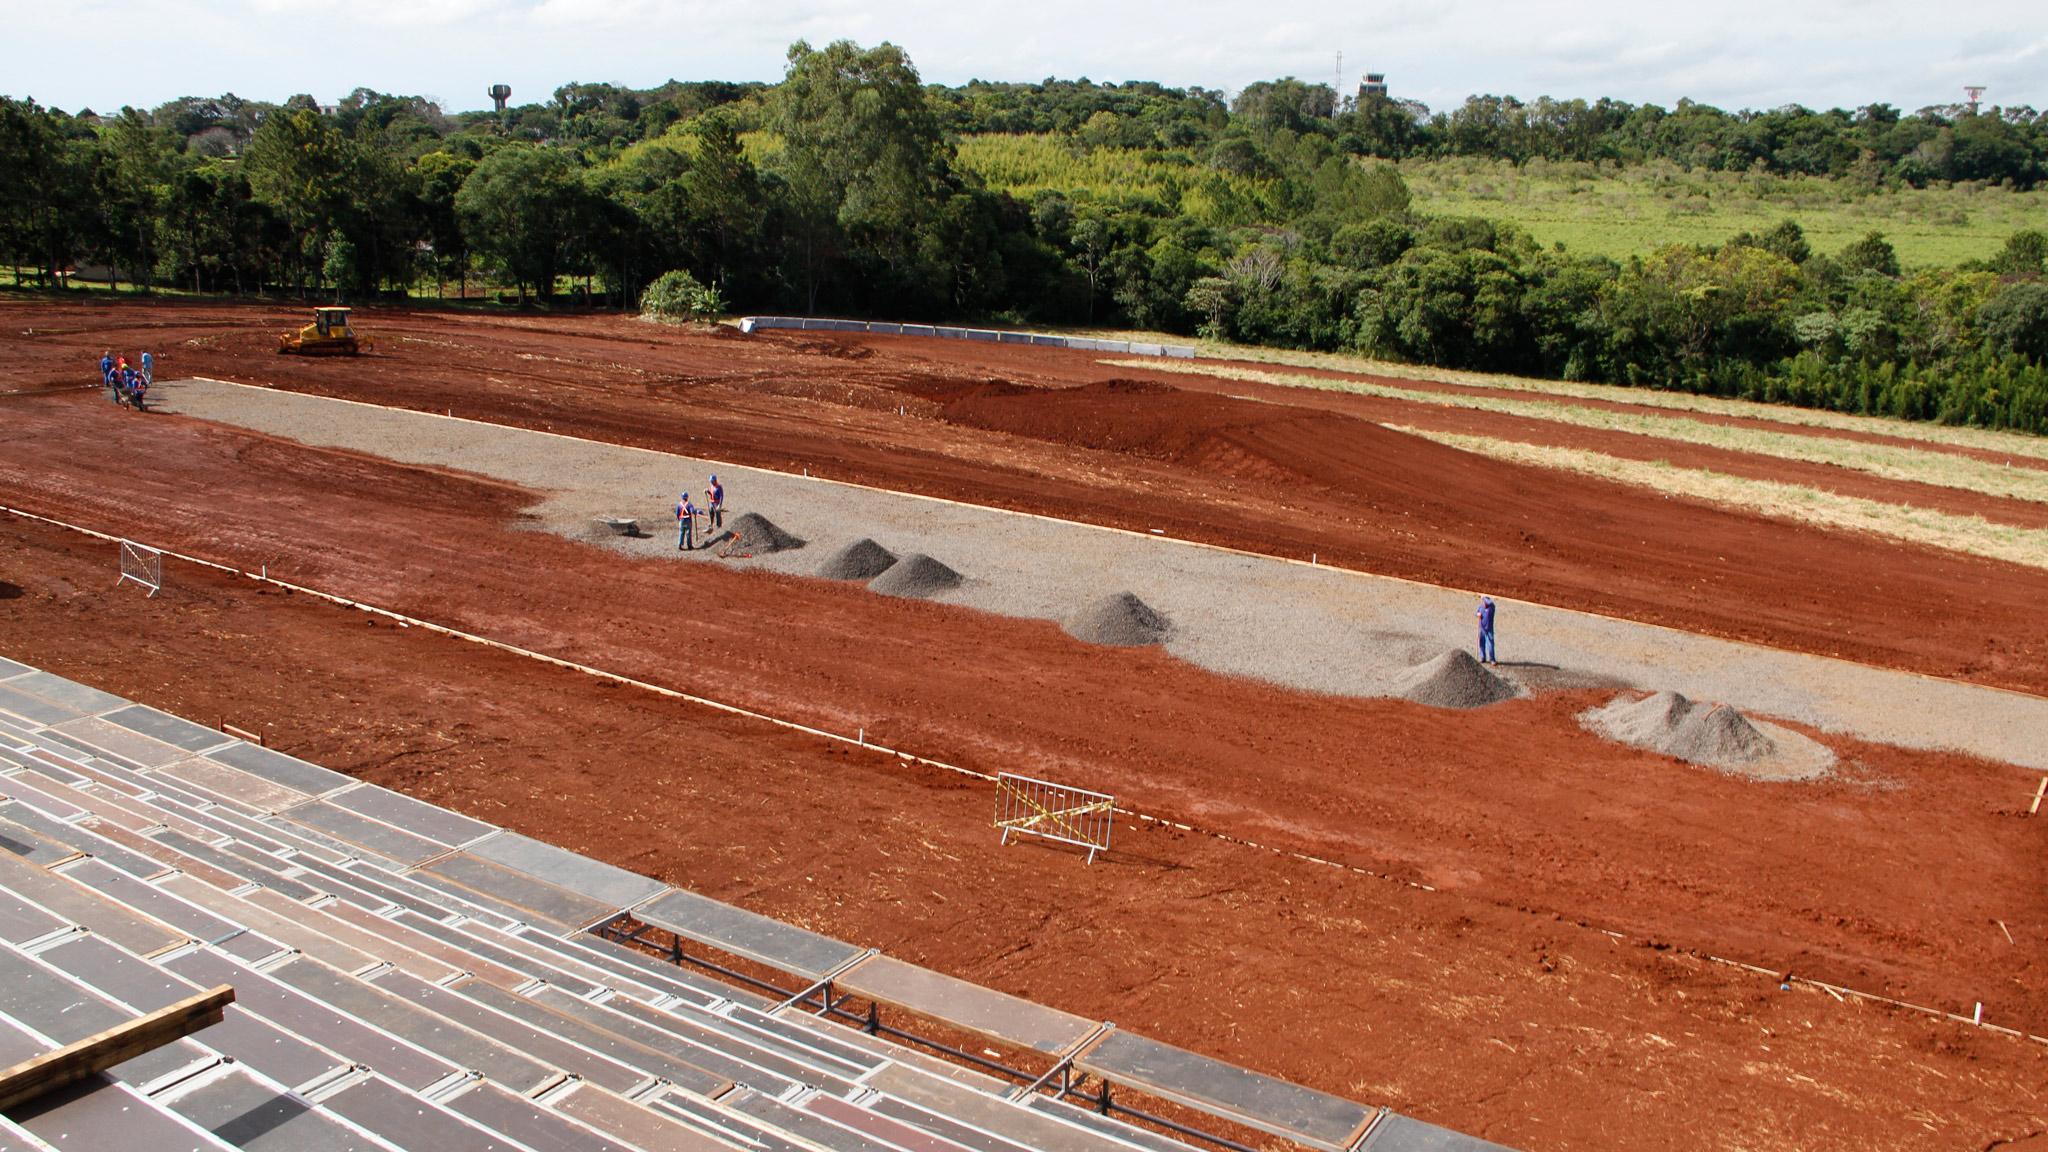 RallyCross construction